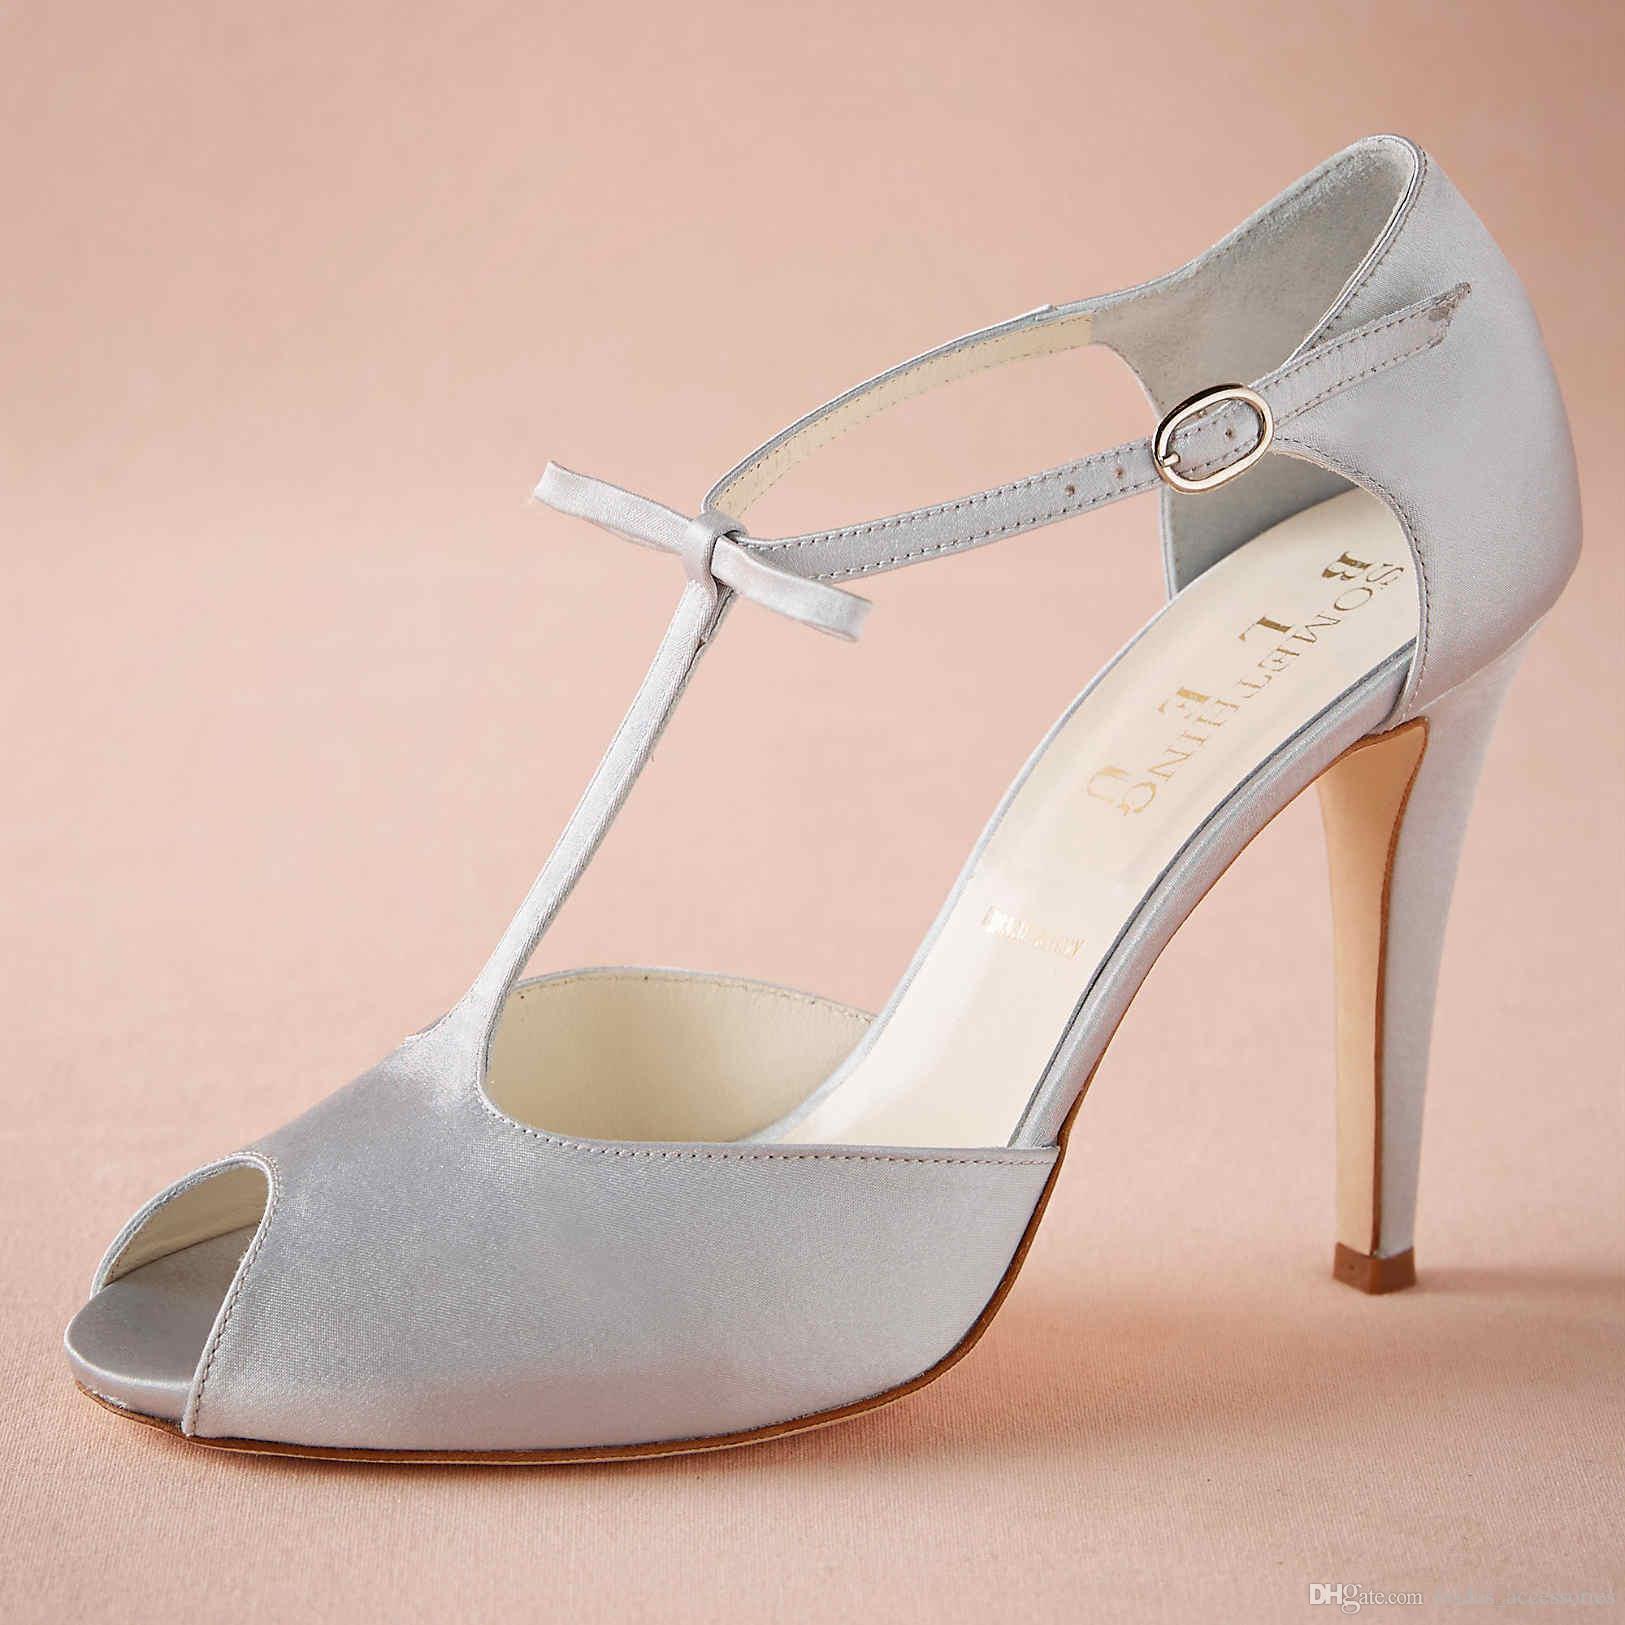 c68d69ab38c Blue Wedding Shoes Peep Toe 2015 Women Pumps Bow T-straps Party Dance 4  High Heels Platform Women Pumps Wedding Wrapped Heel Custom Made